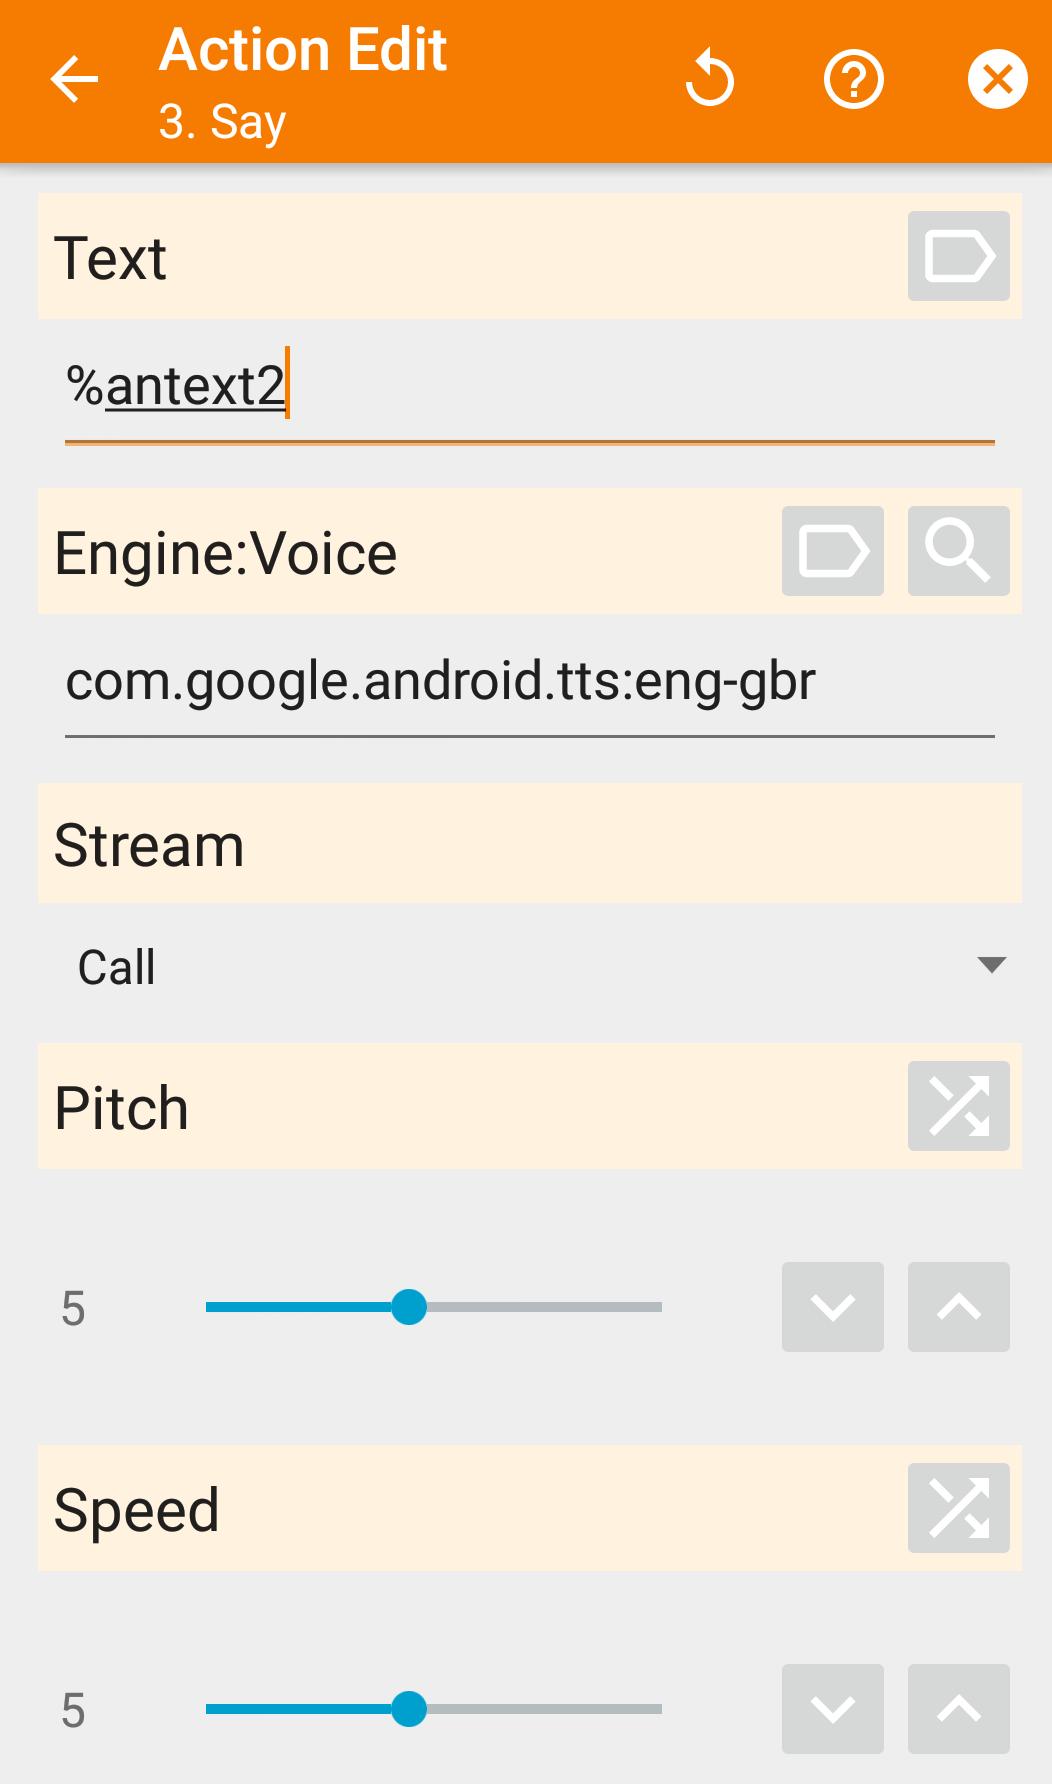 Making voice announcements & controlling Amazon Alexa Echo